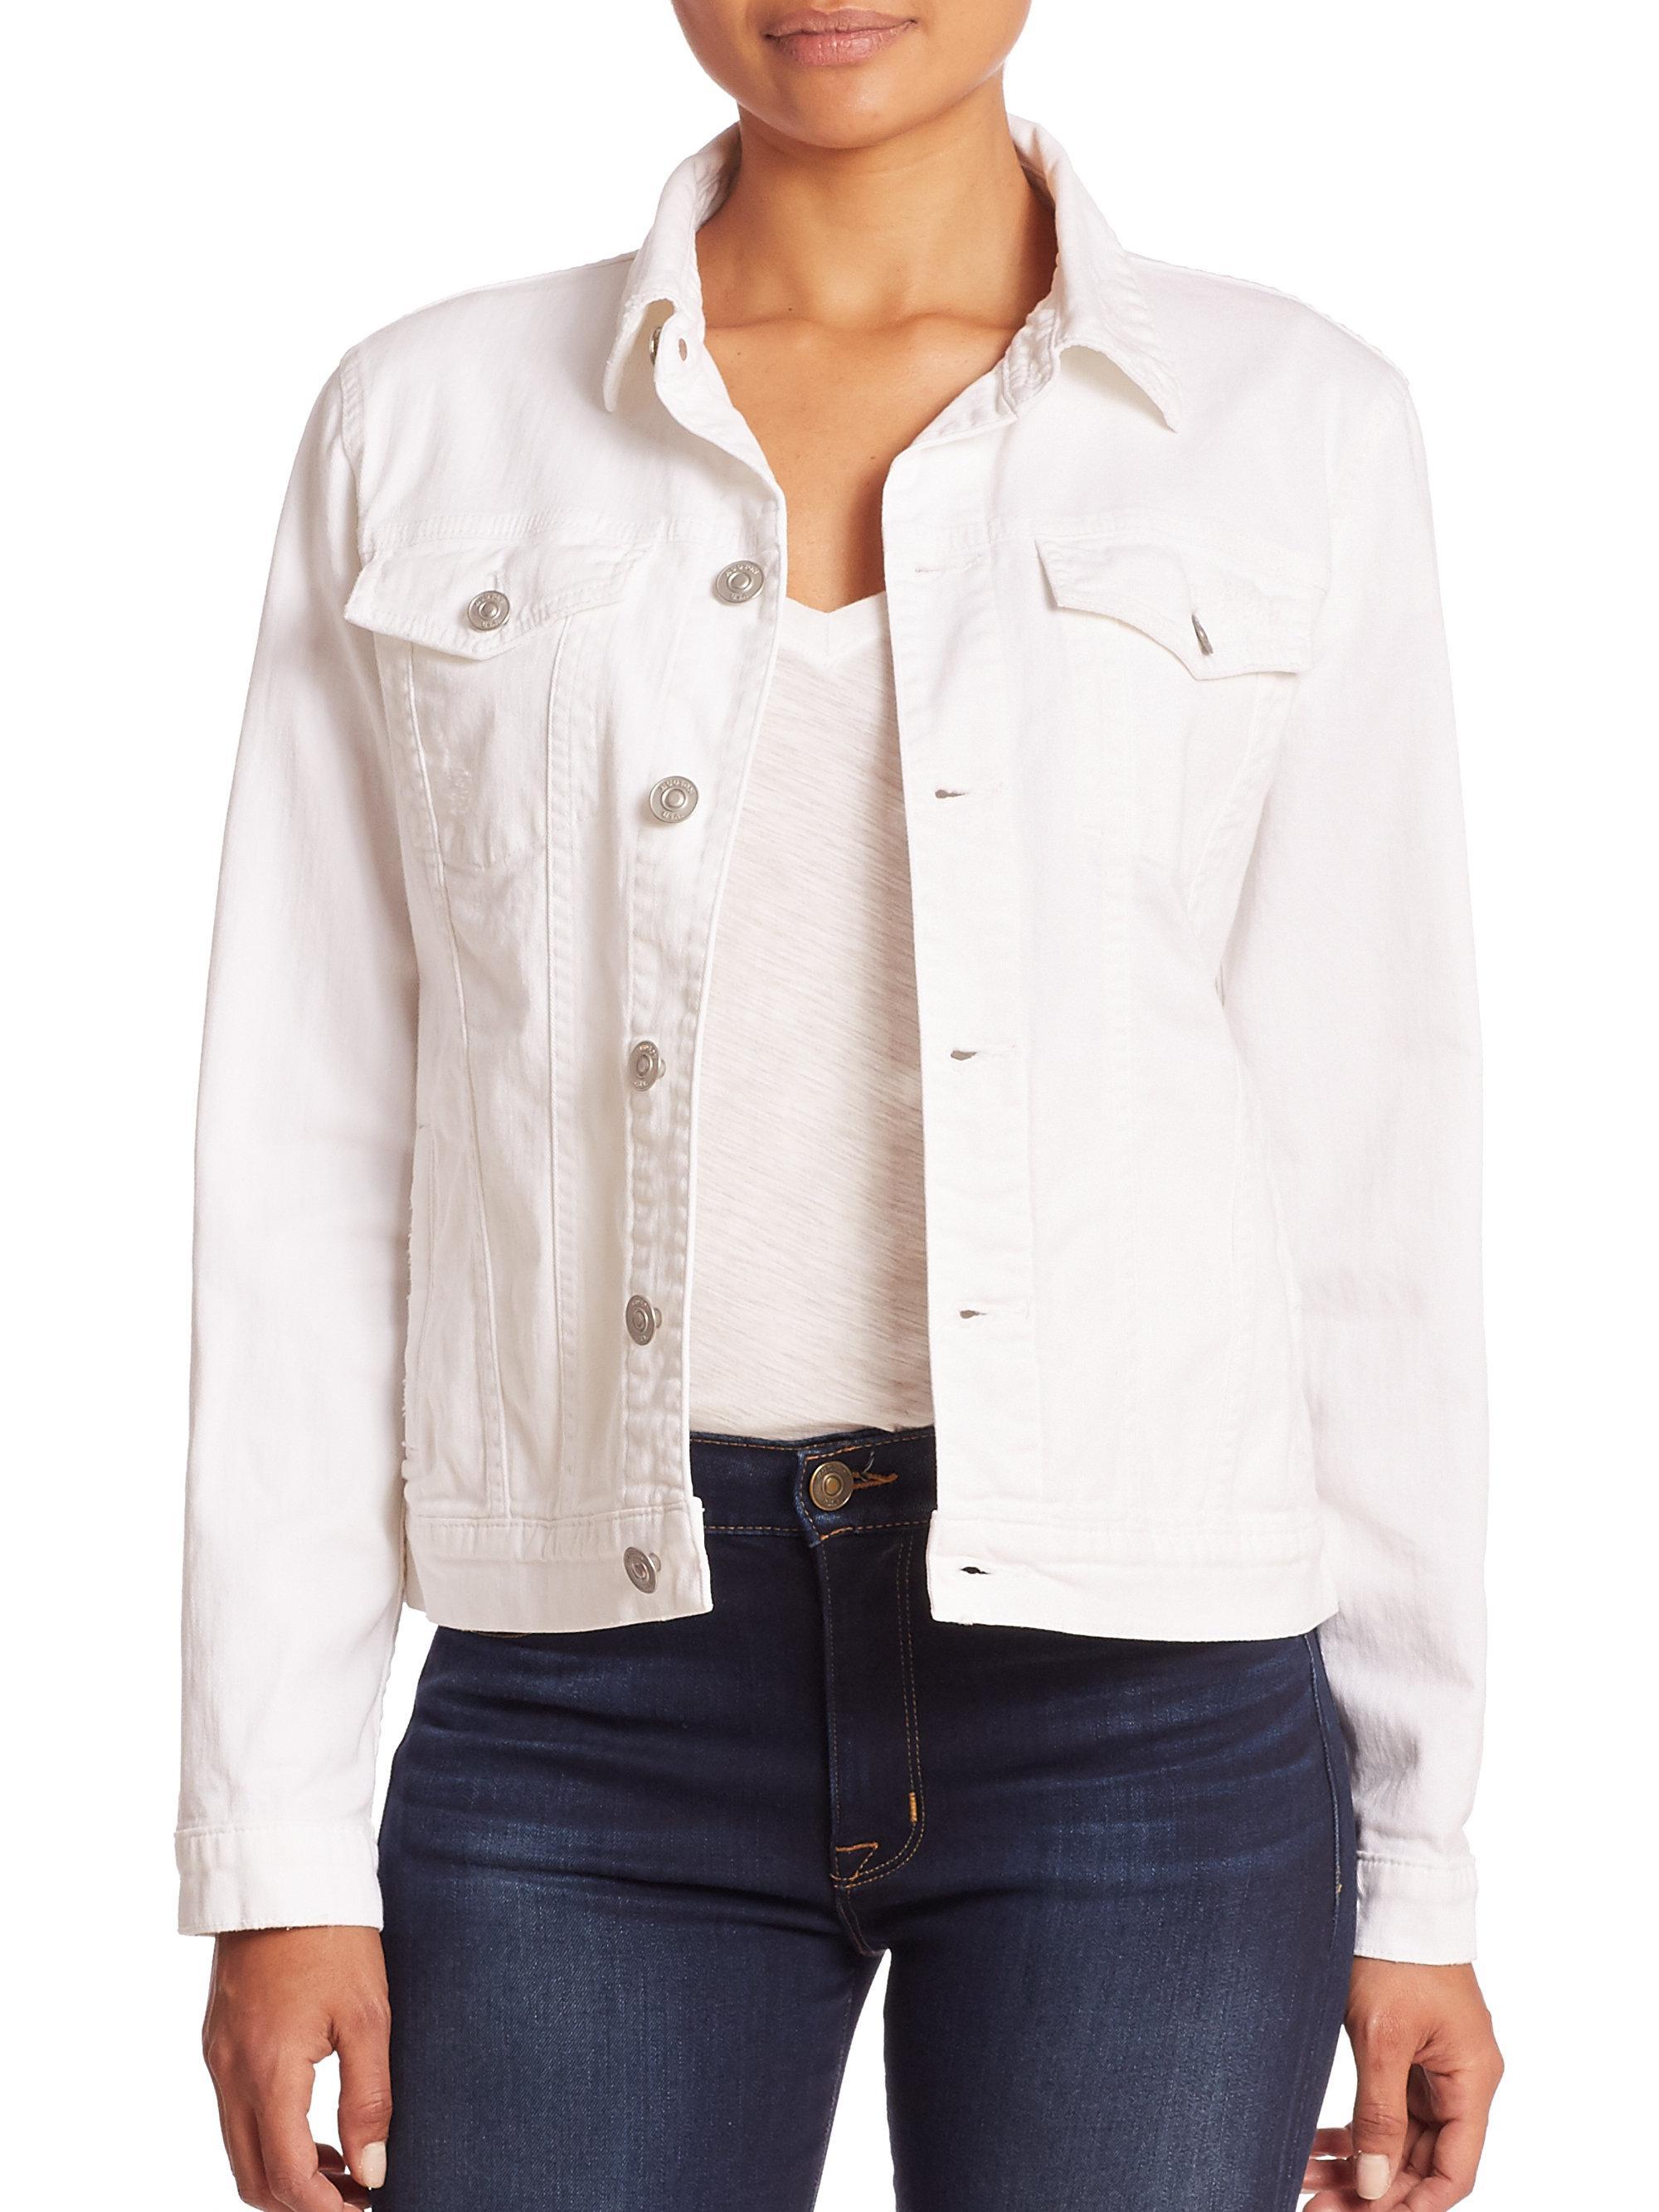 311e91905276 Lyst - Hudson Jeans Signature Denim Jacket in White